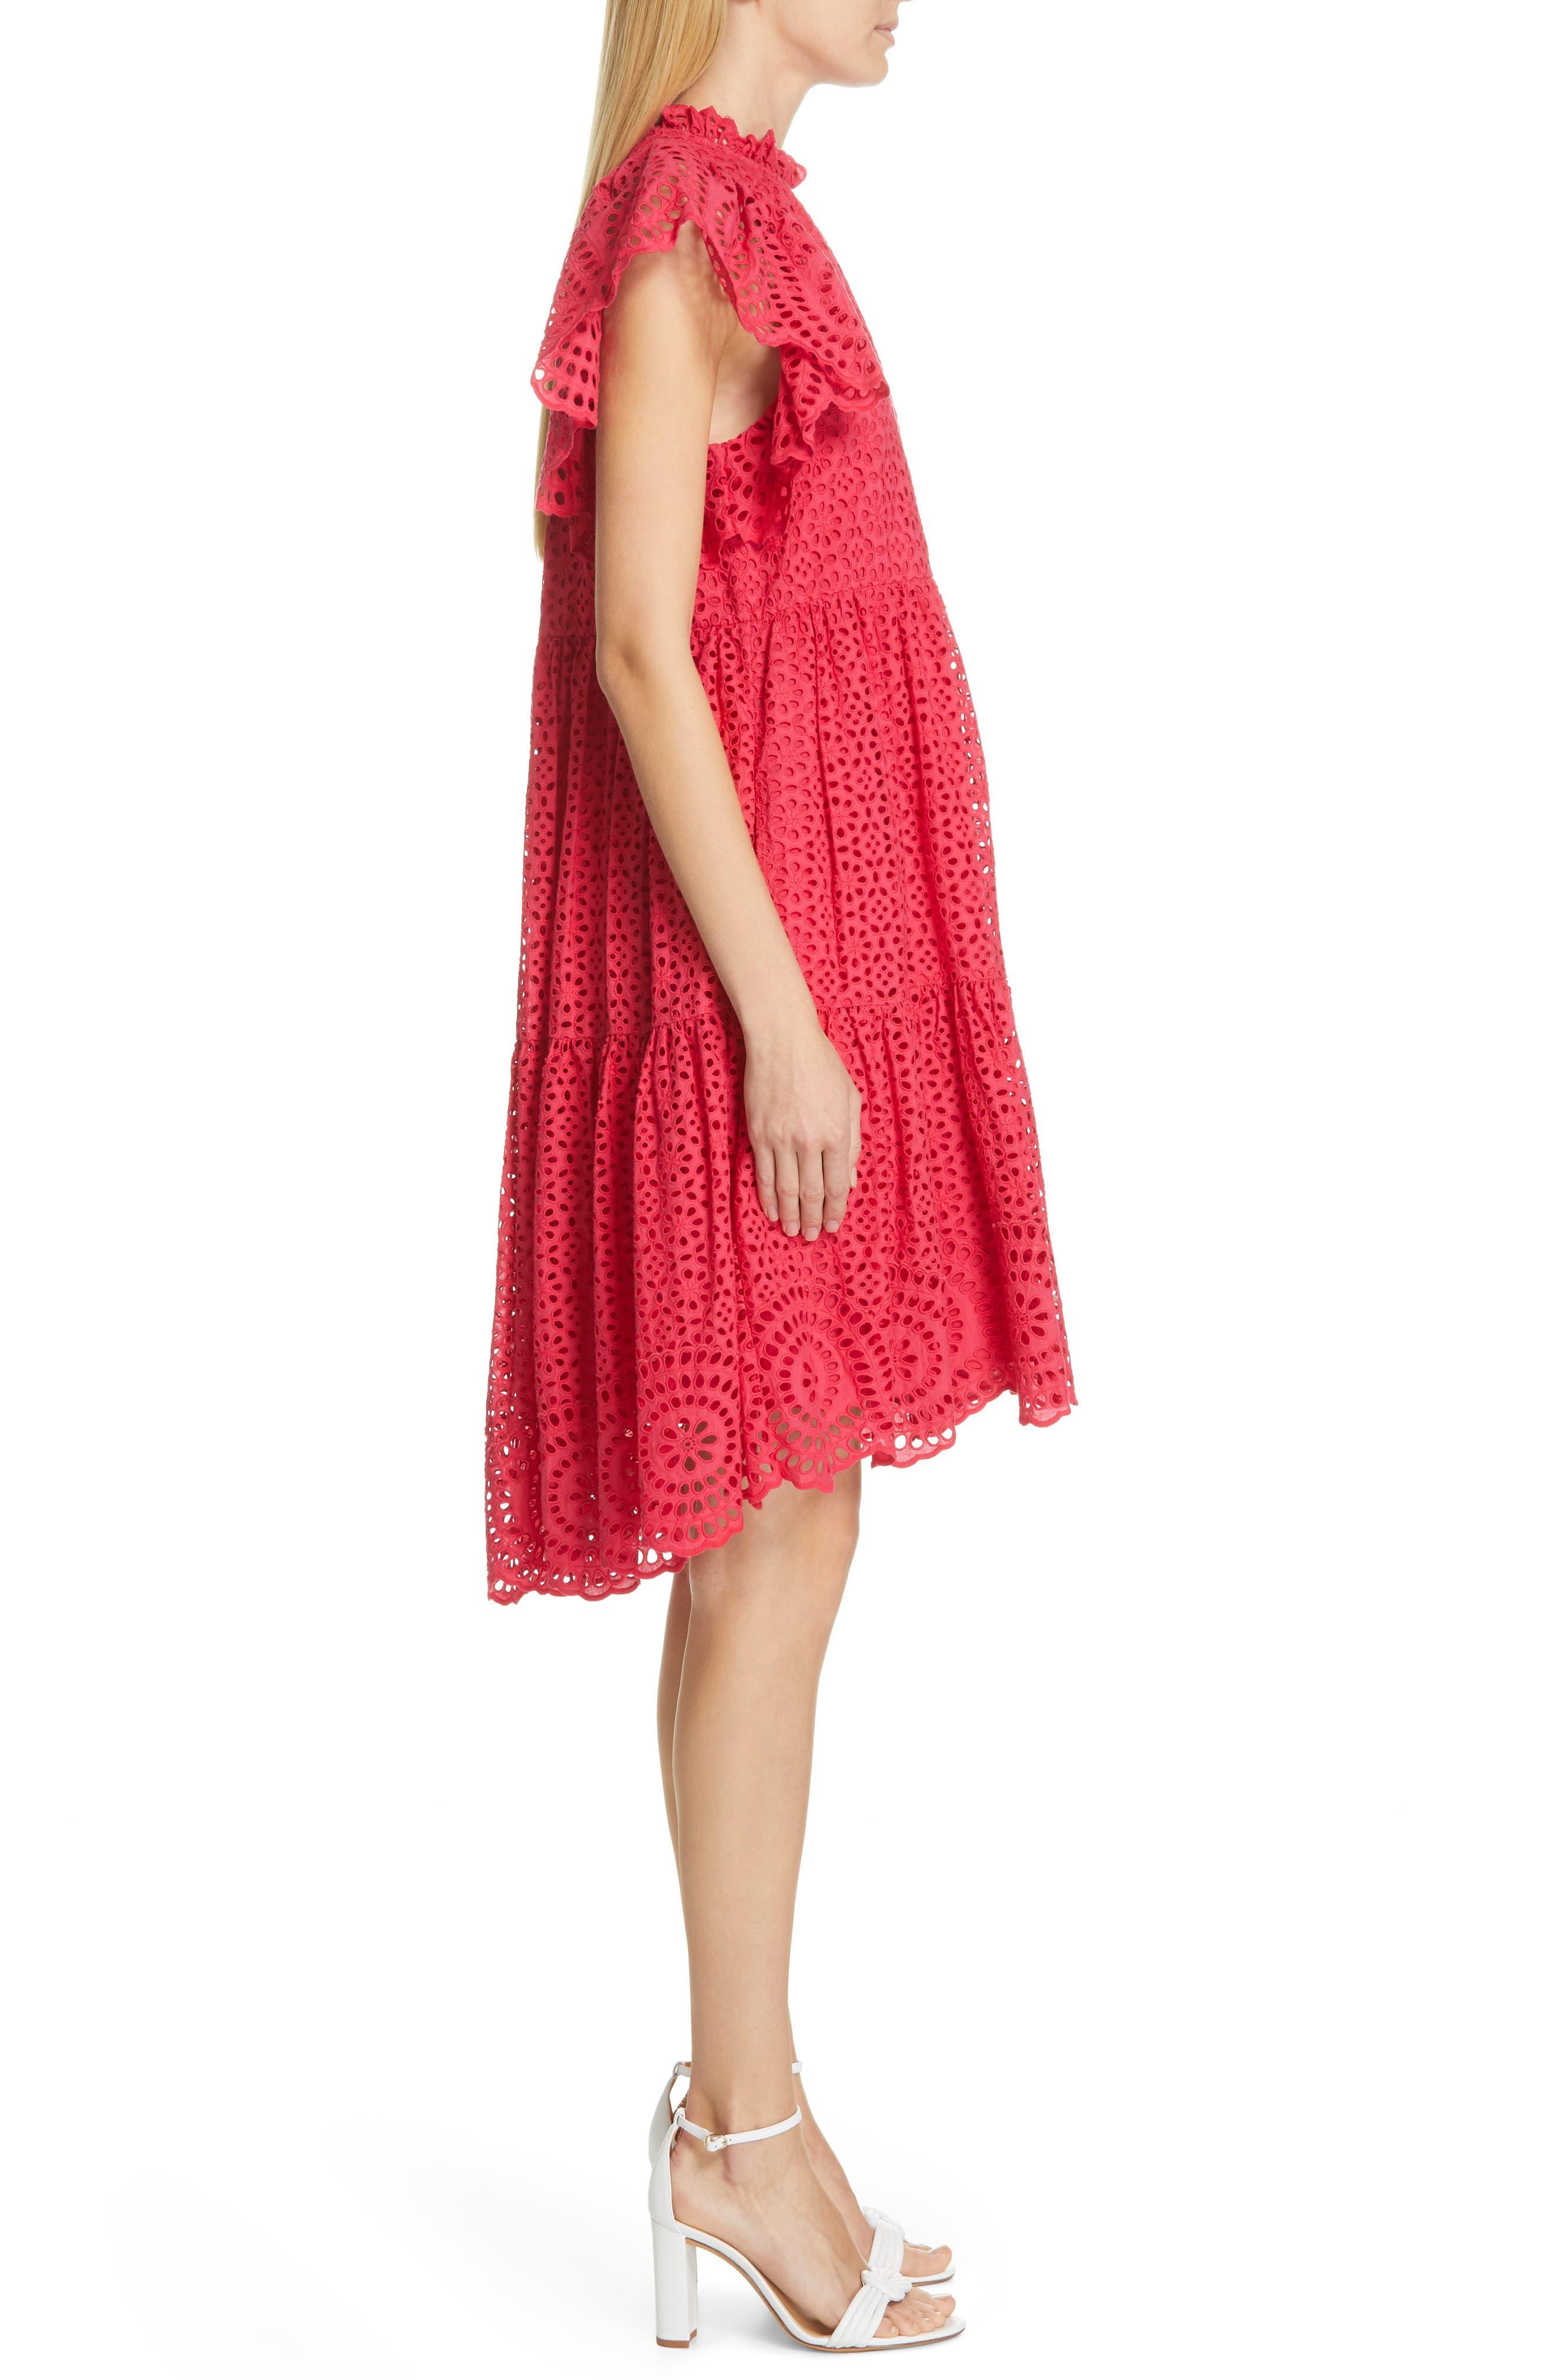 ULLA JOHNSON, Norah Eyelet Dress, Alternate thumbnail 4, color, FUCHSIA